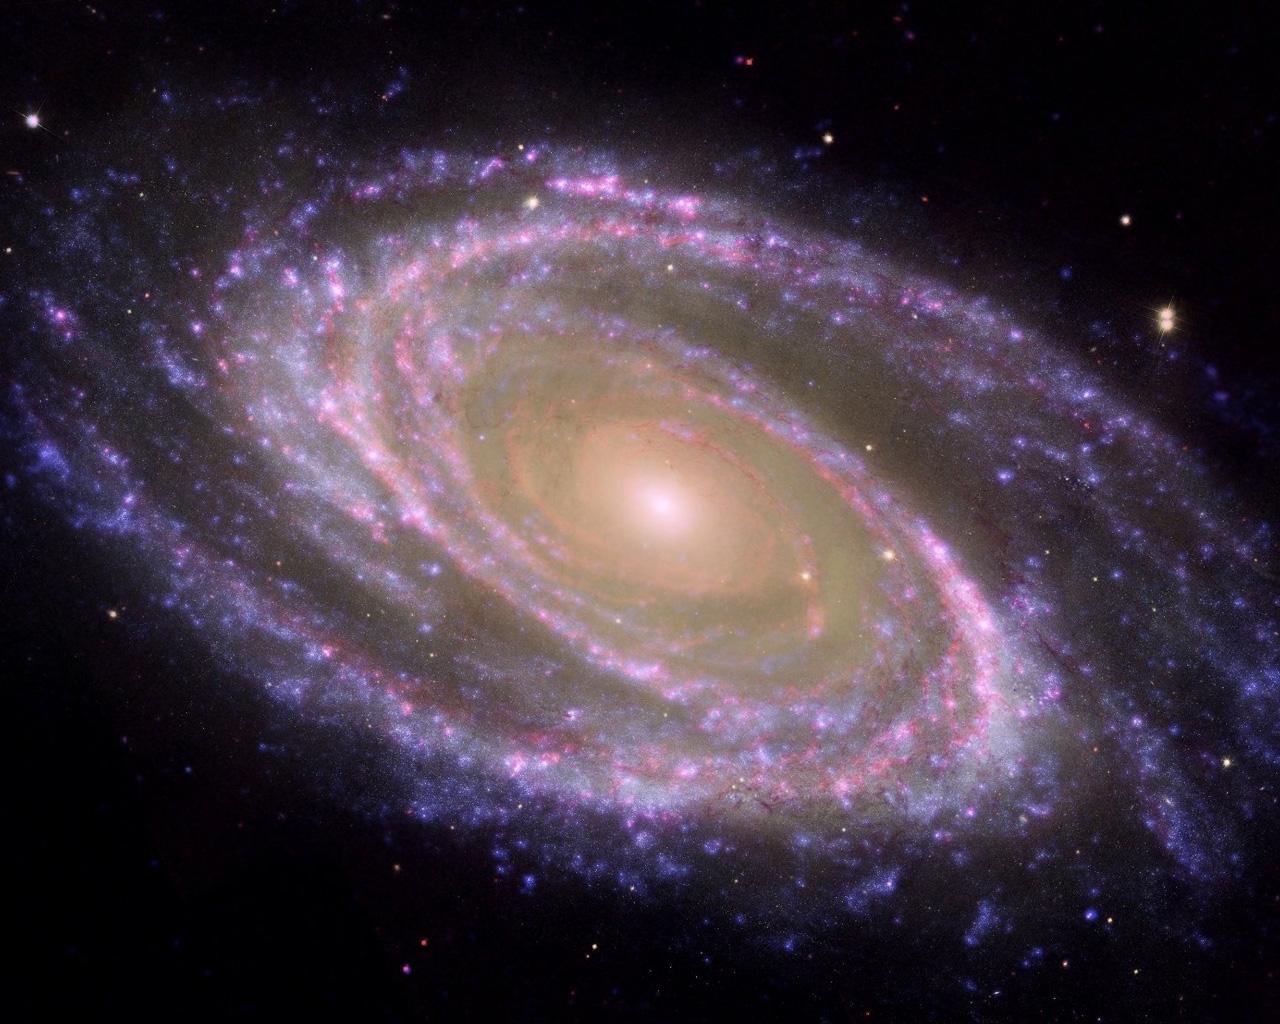 1280x1024 Spiral Galaxy M81